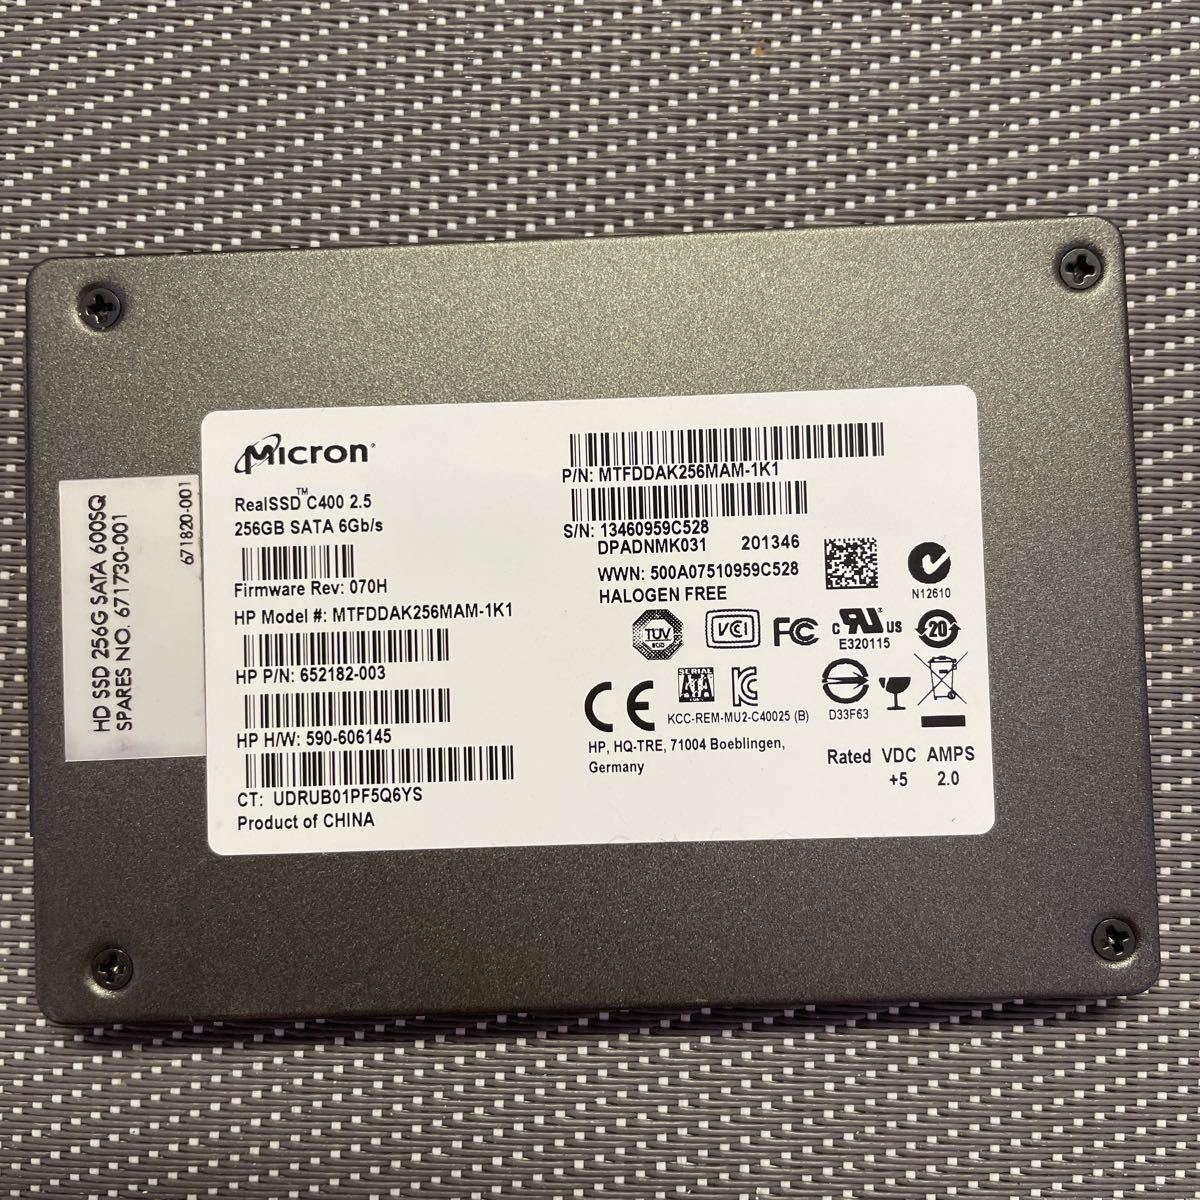 Micron SSD 2.5インチSATA 256GB使用時間2737h